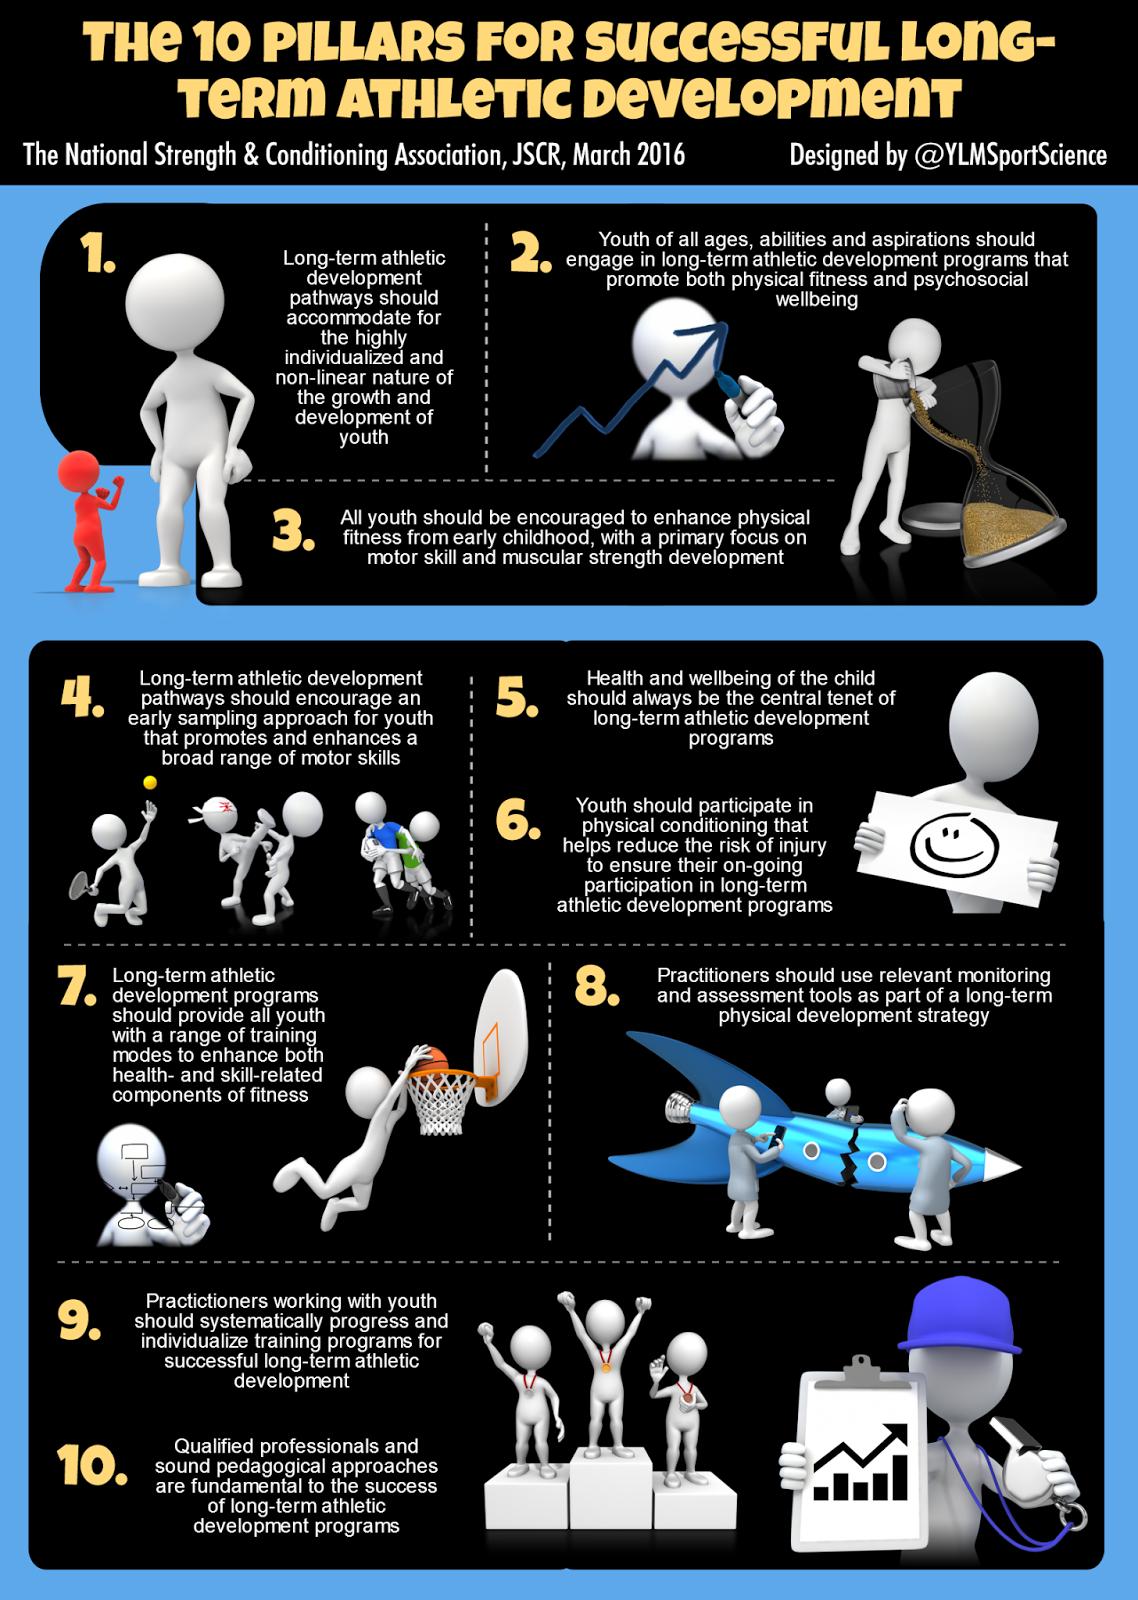 ylmsportscience.com - The 10 Pillars for Successful Long-term Athletic Development